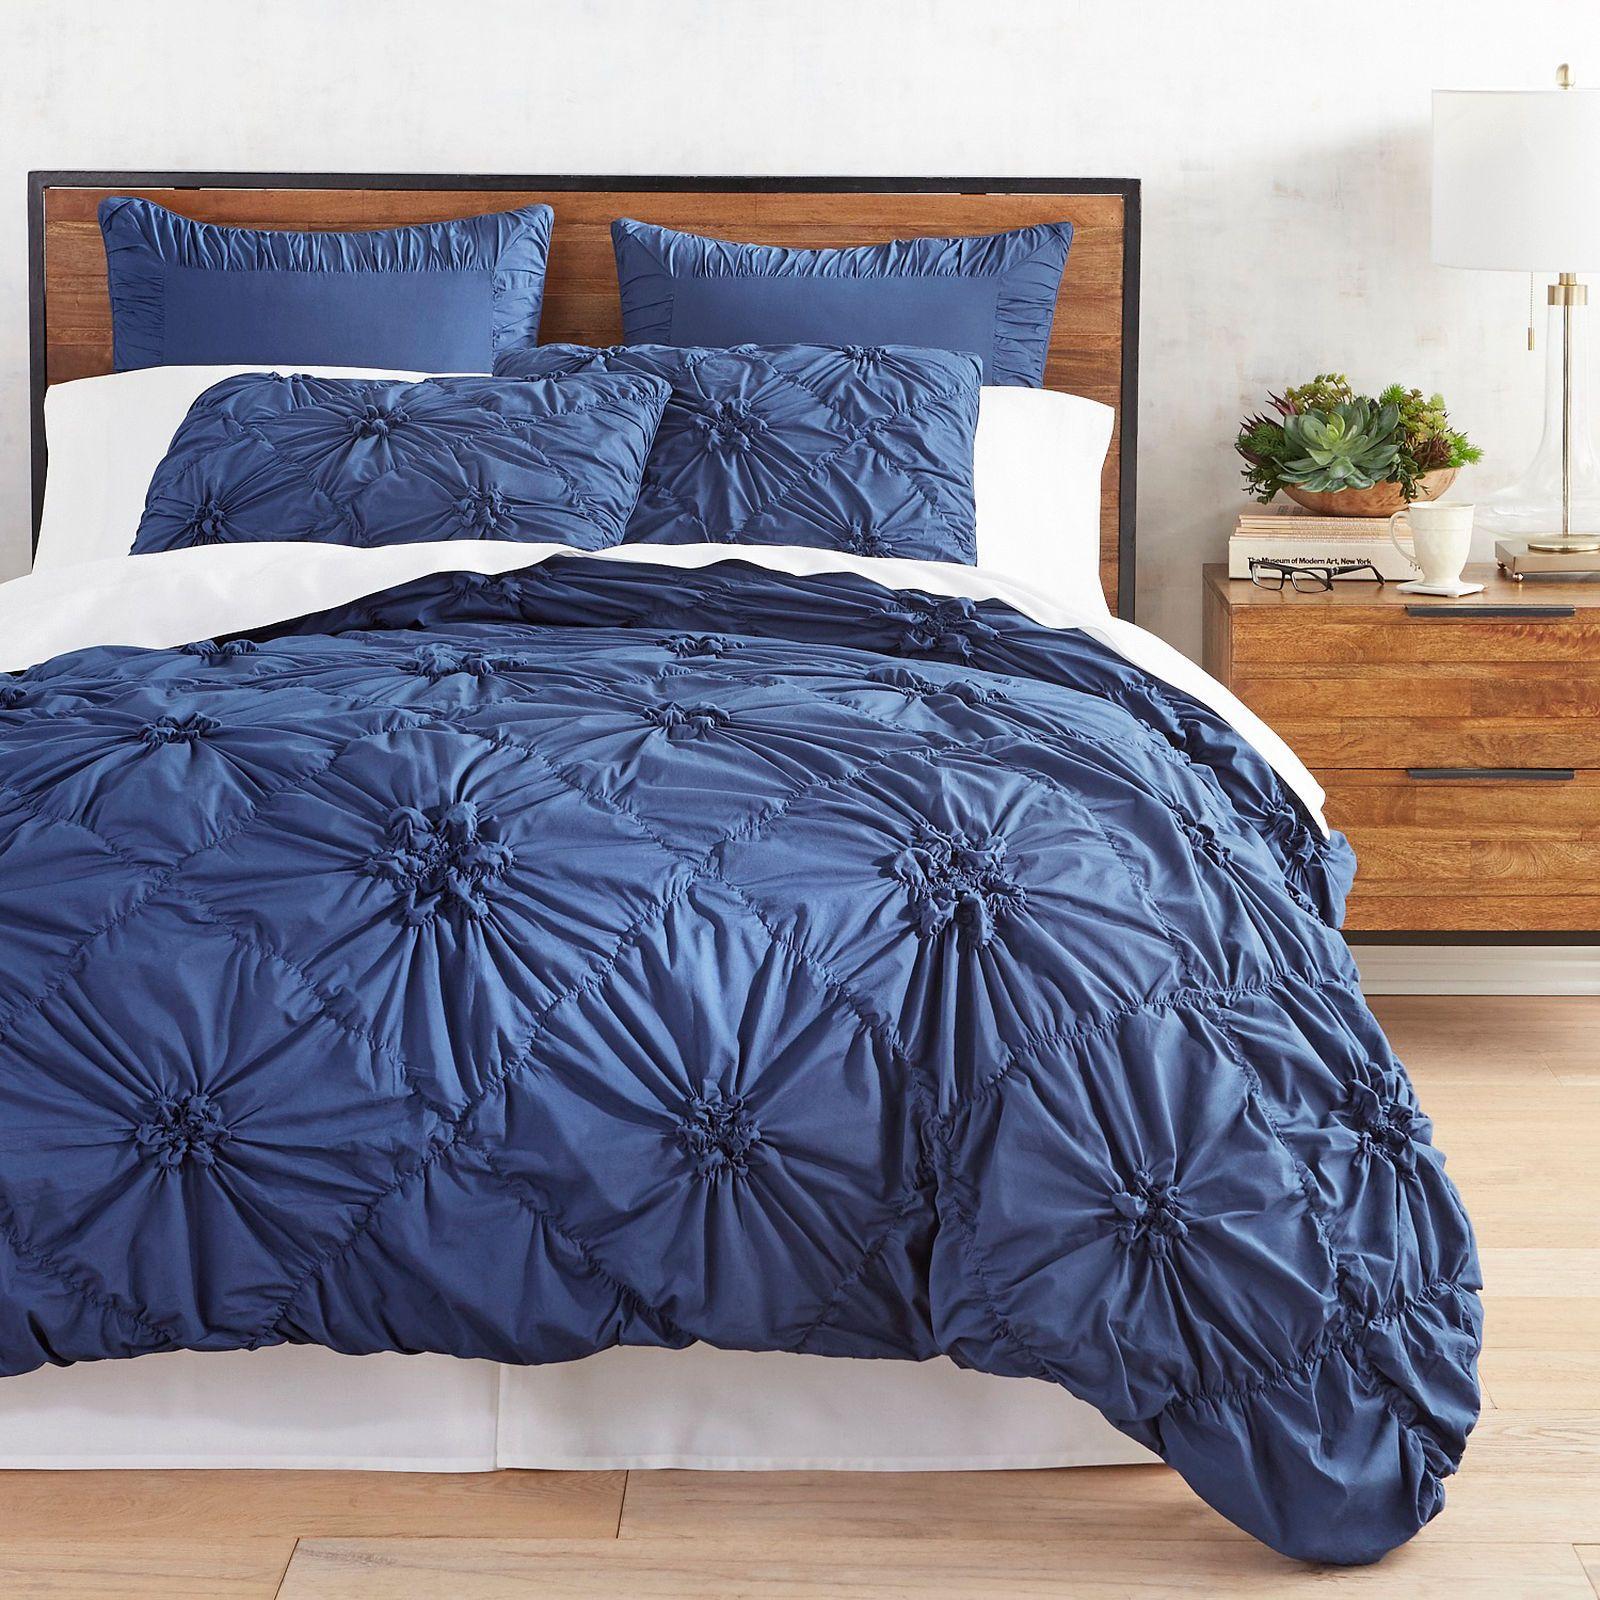 Savannah Midnight Blue Duvet Cover & Sham Pier 1 Imports